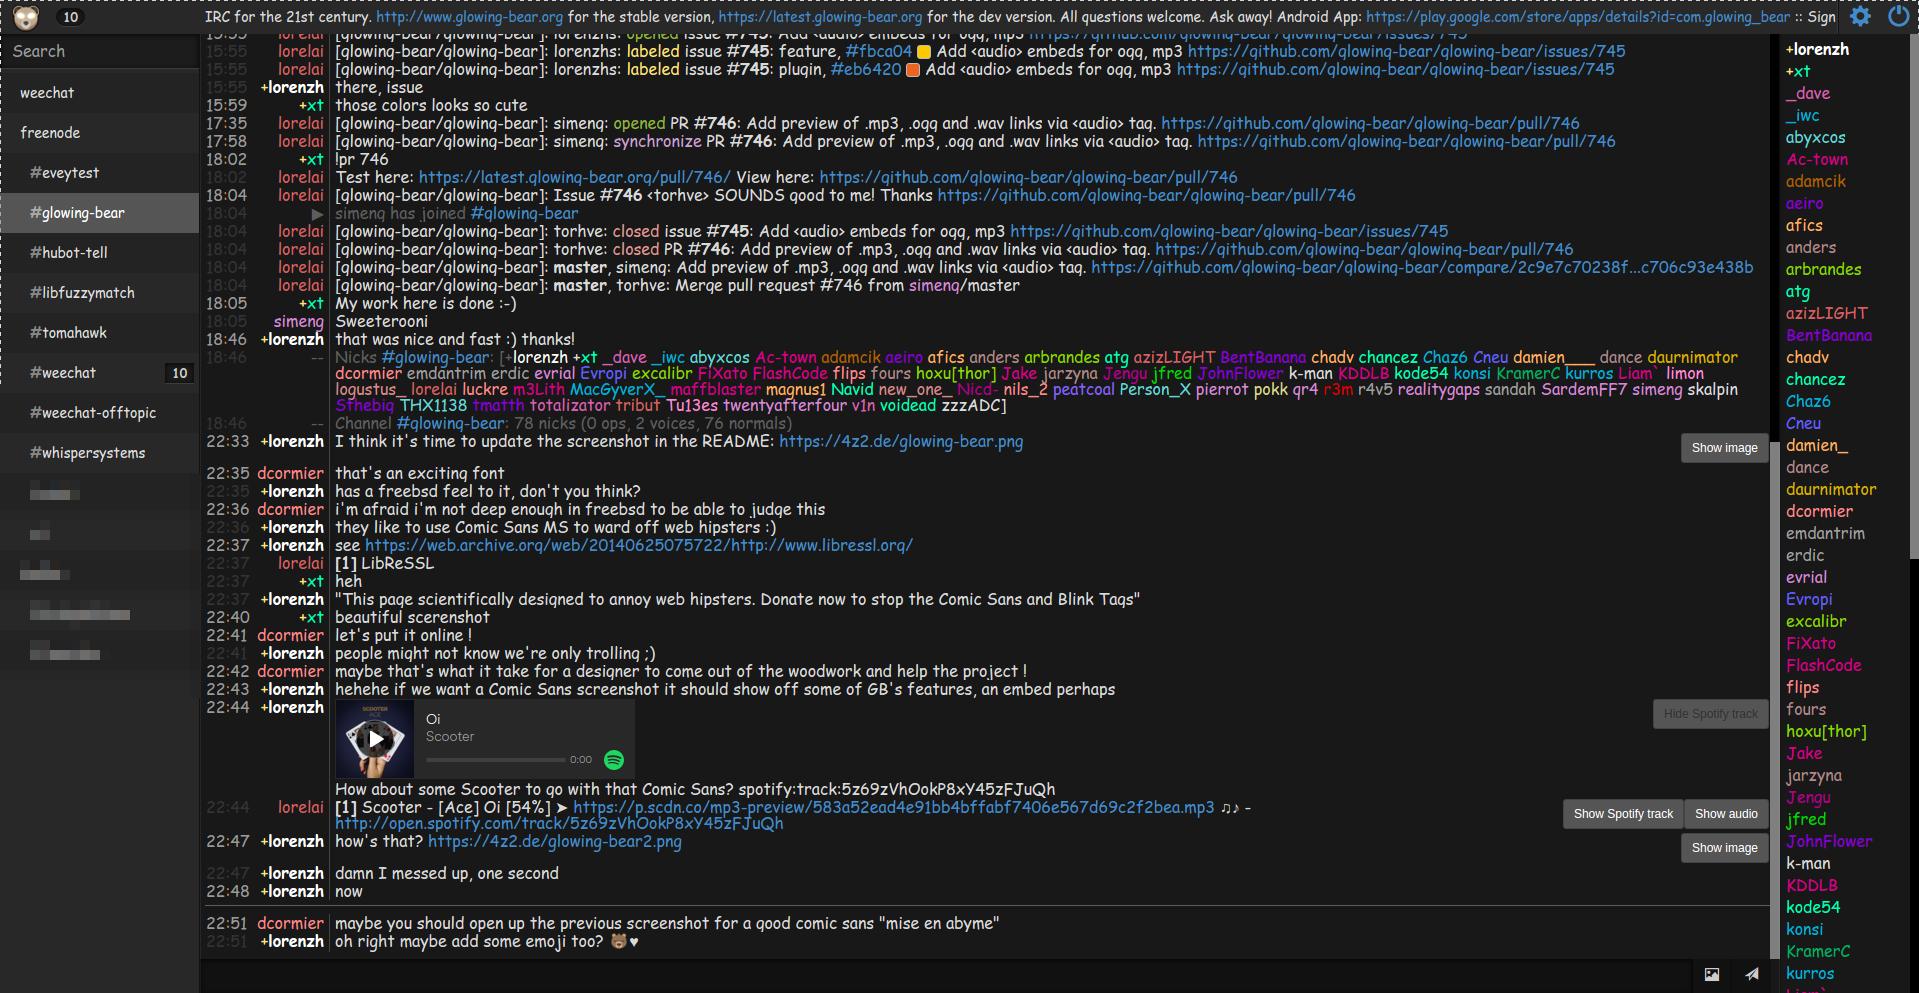 Glowing Bear screenshot with lots of Comic Sans MS